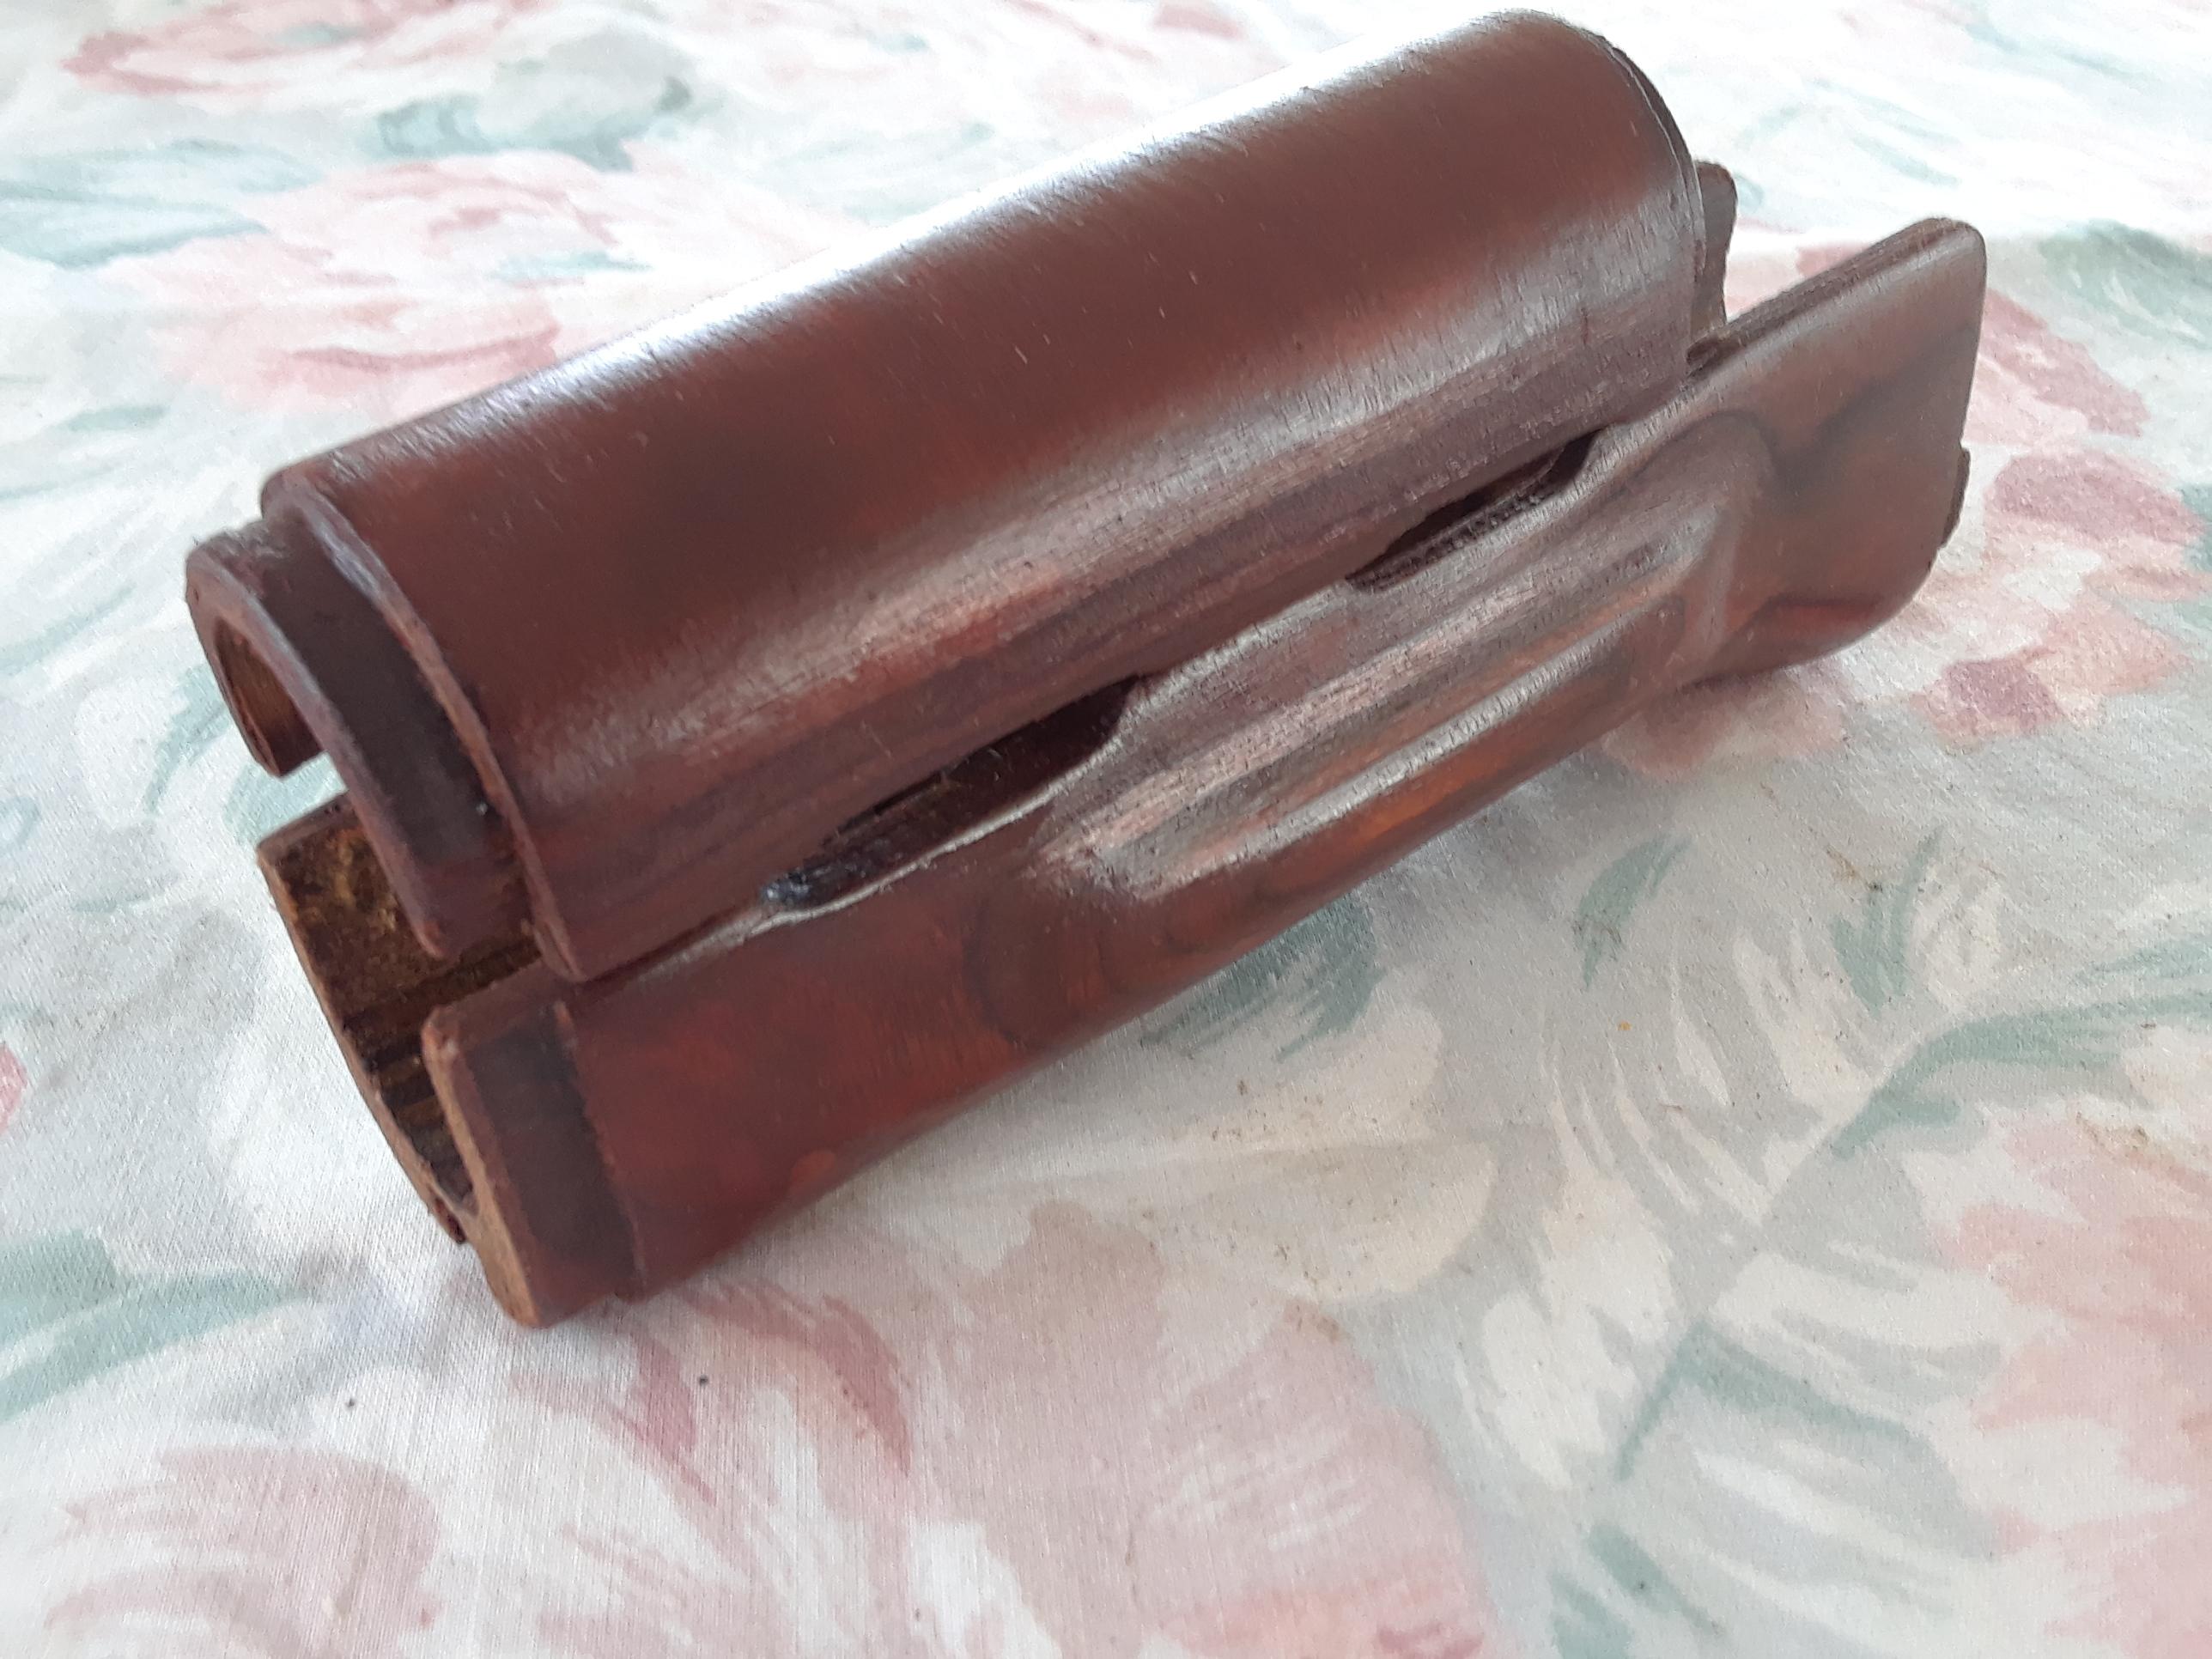 Genuine Russian AK-47 AKM Laminated Wooden Hand-Guard PALM